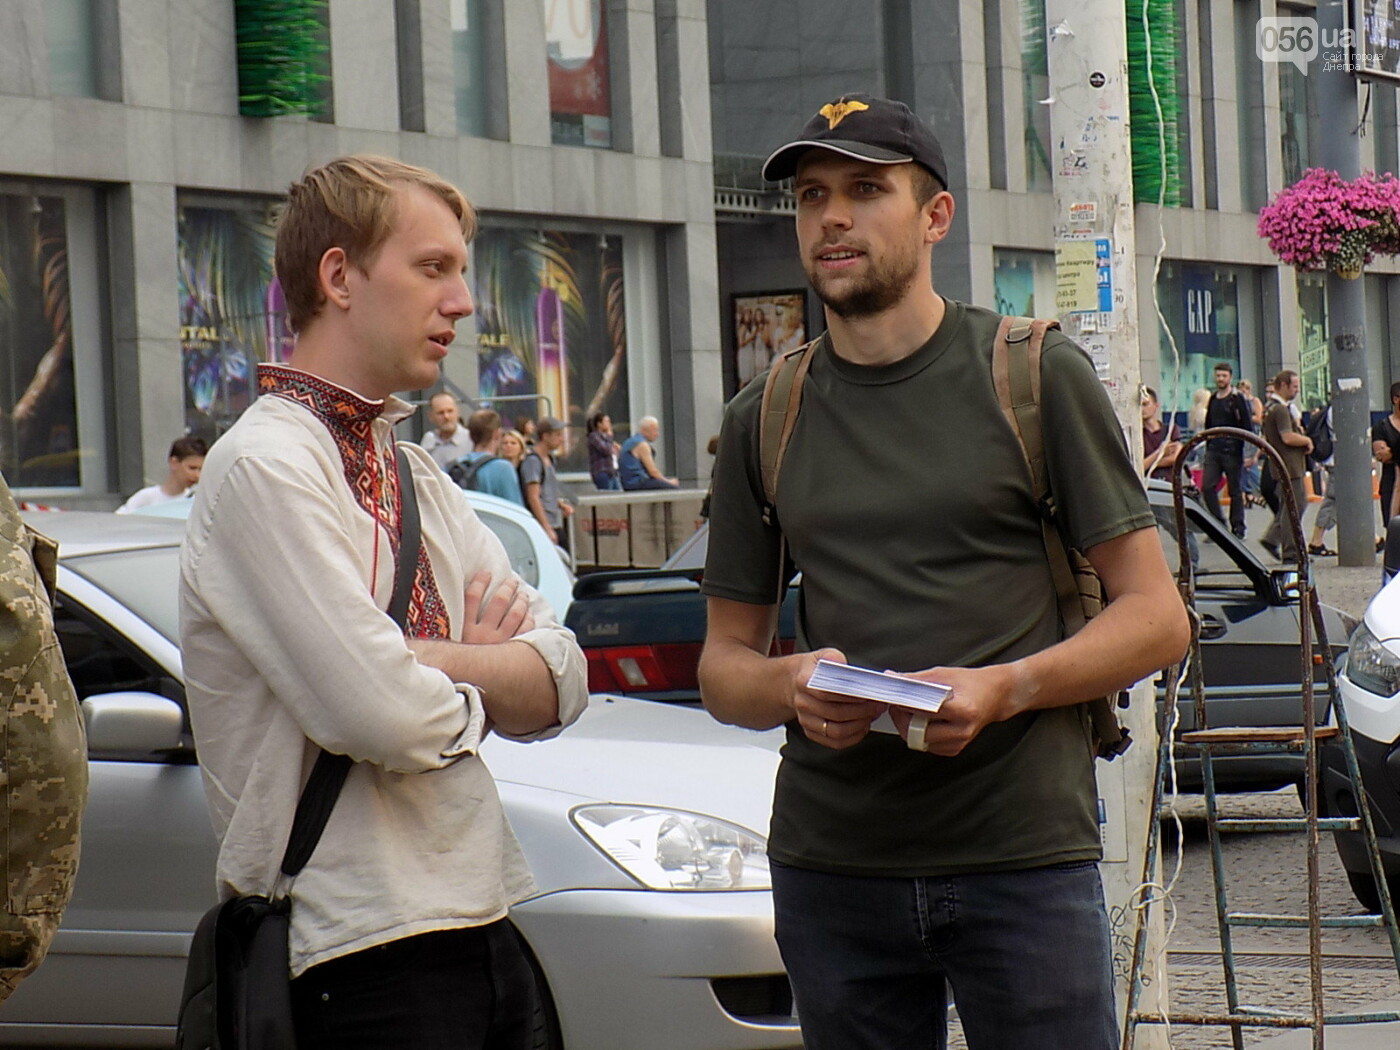 """Мова єднає Дніпро"": в центре города прошла символическая акция с концертом и подарками, - ФОТО, фото-4"